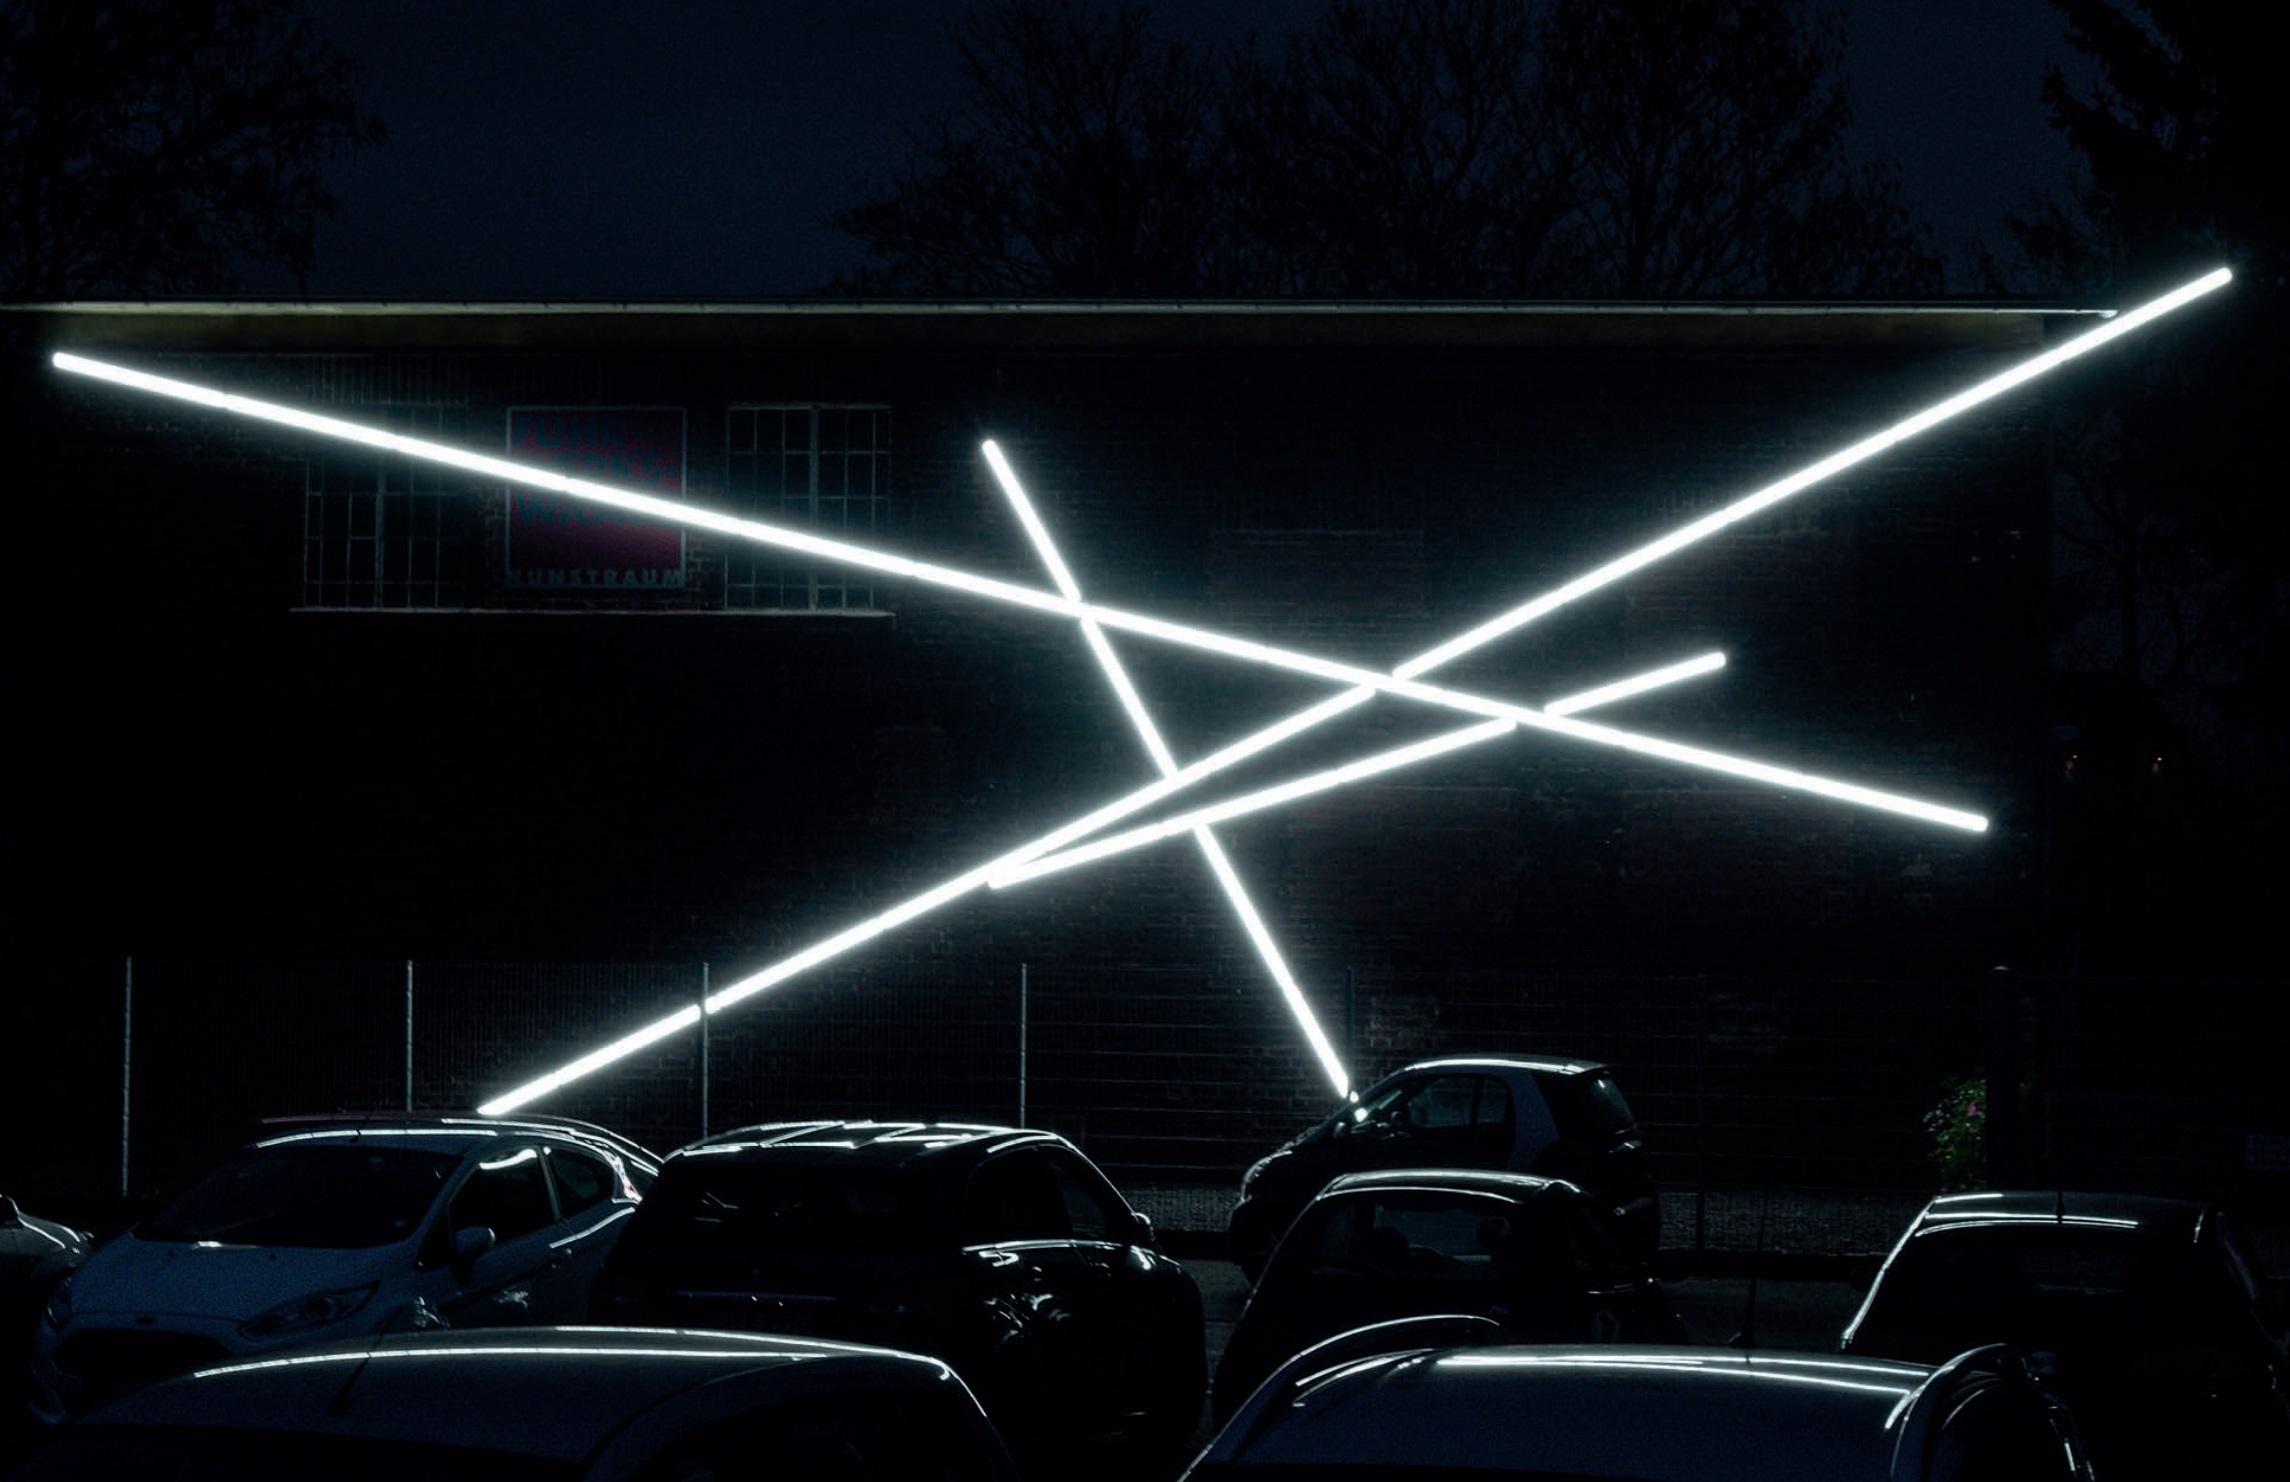 Kirstin Arndt, Ortsbezogene Lichtinstallation Site specific Light Installation, Köln 2016